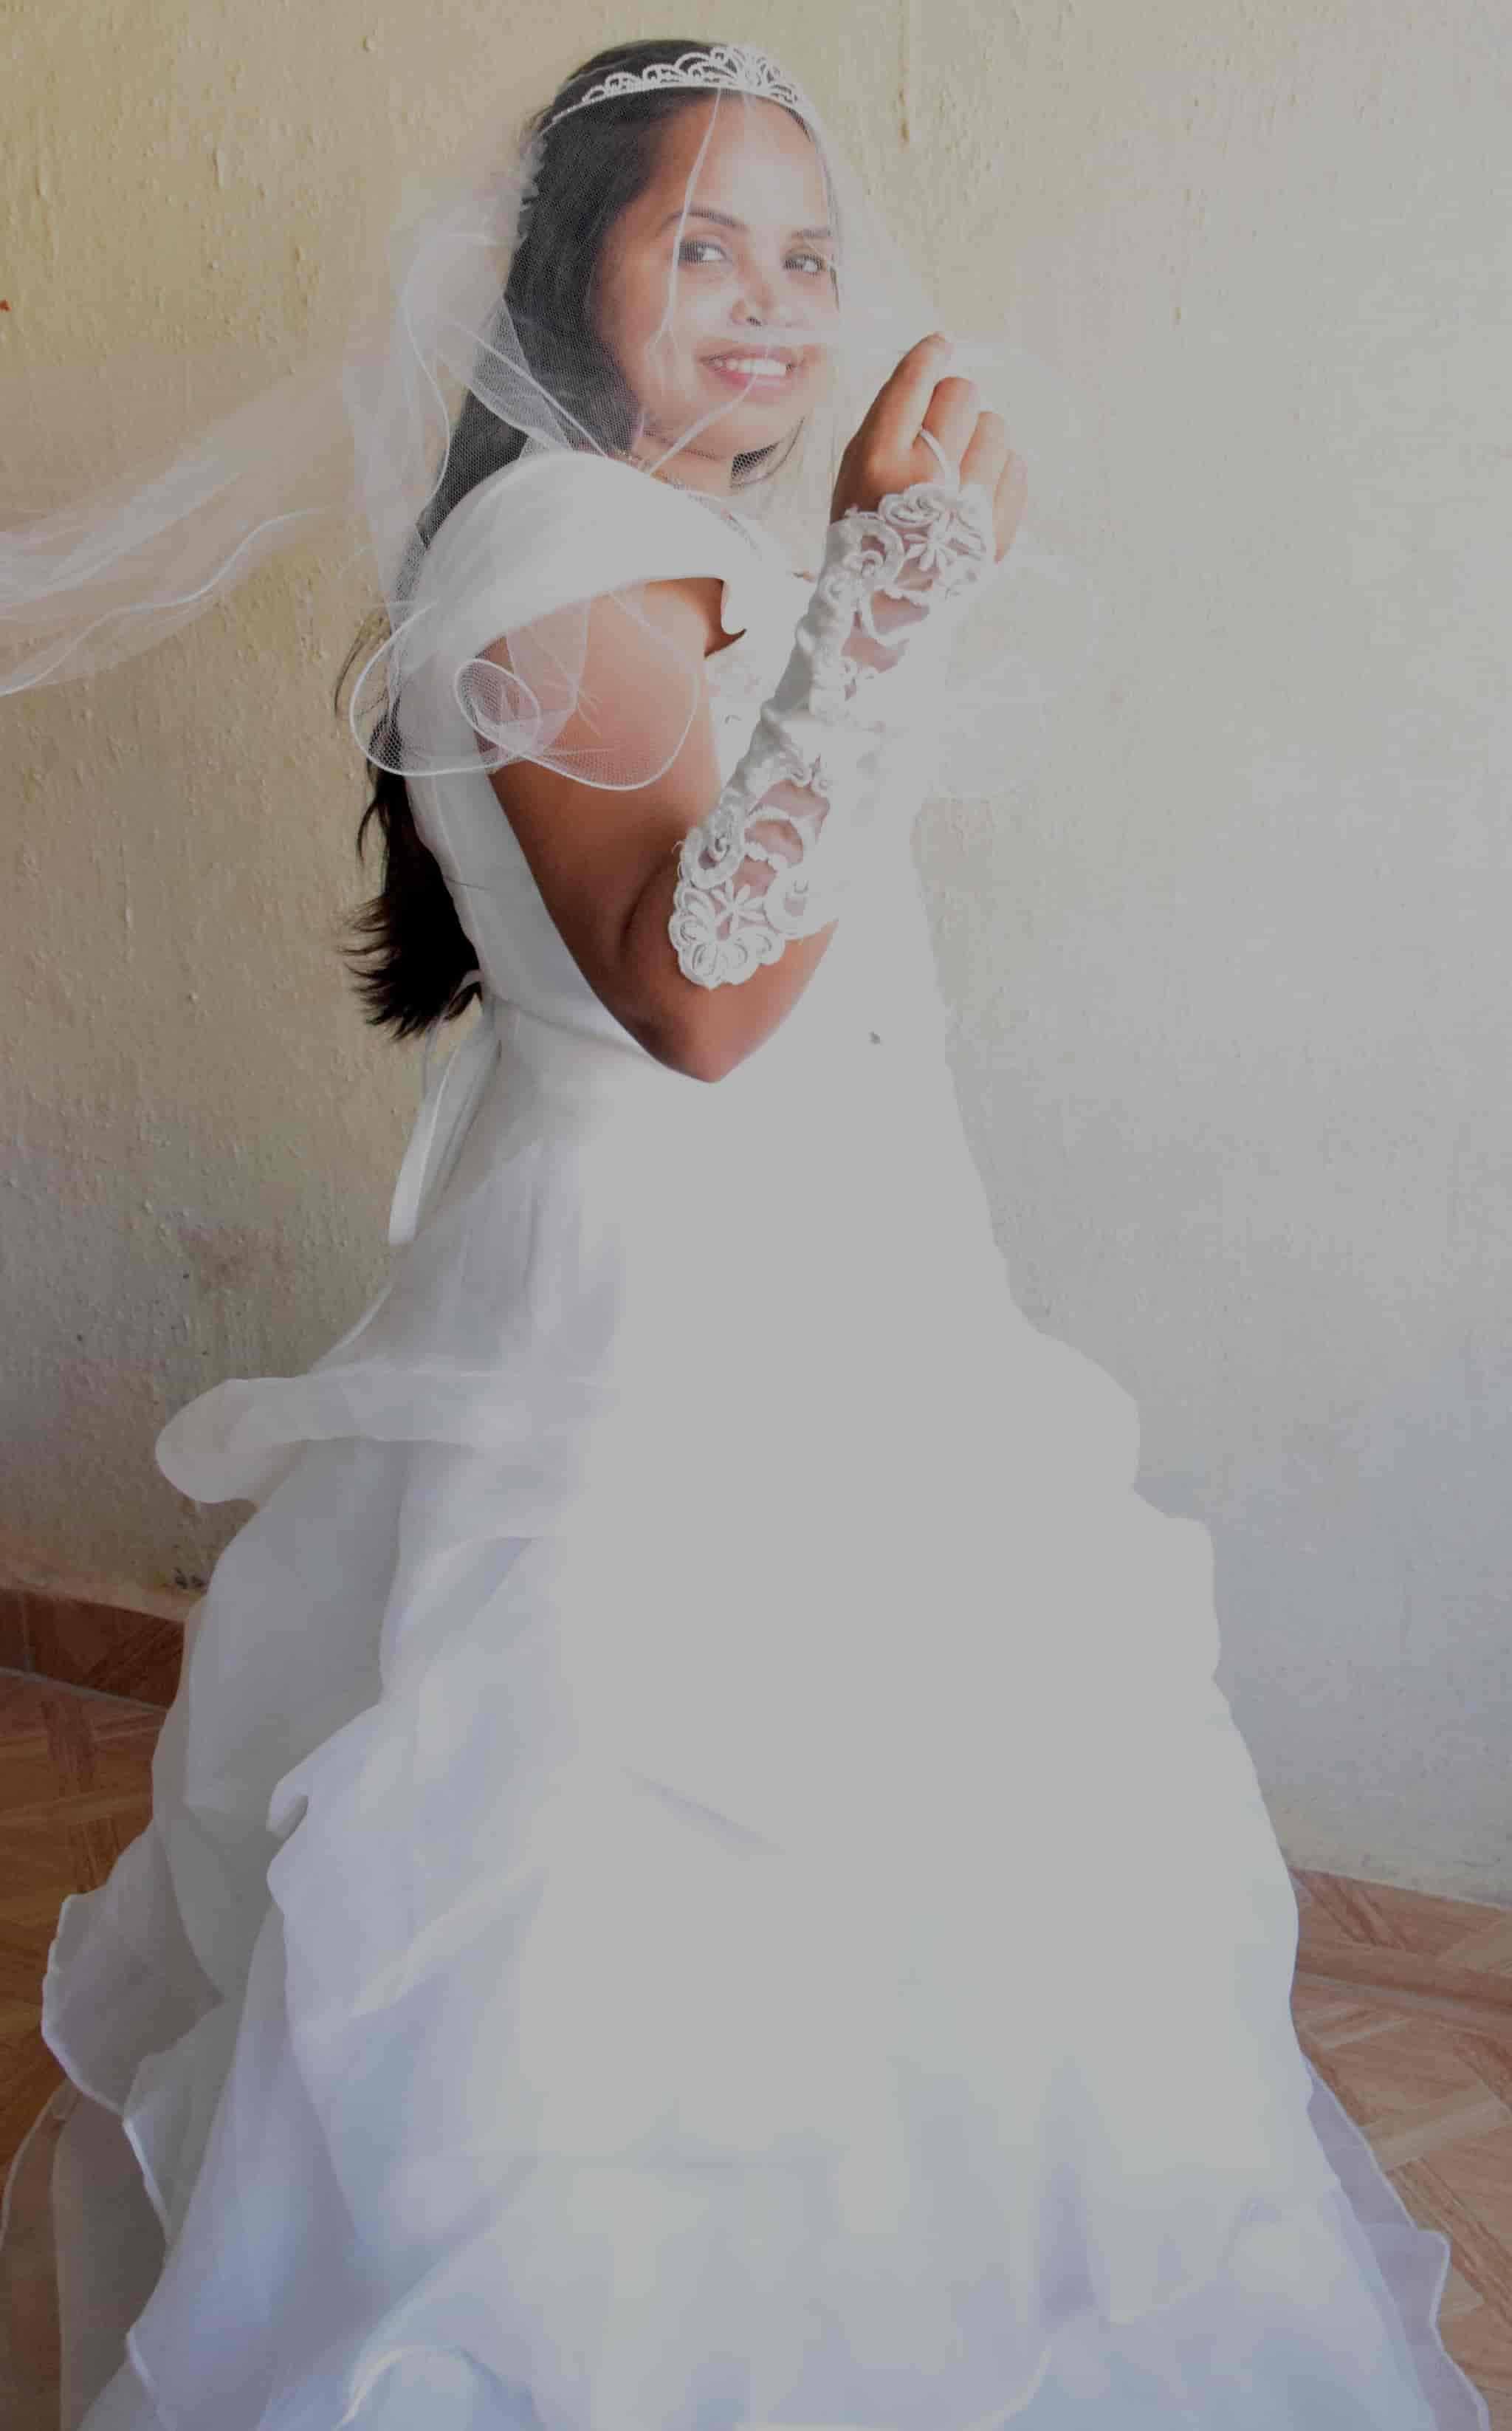 e1e7f2ebca49 Brides 1 Stop, Goregaon East - Bridal Wear On Hire in Mumbai - Justdial